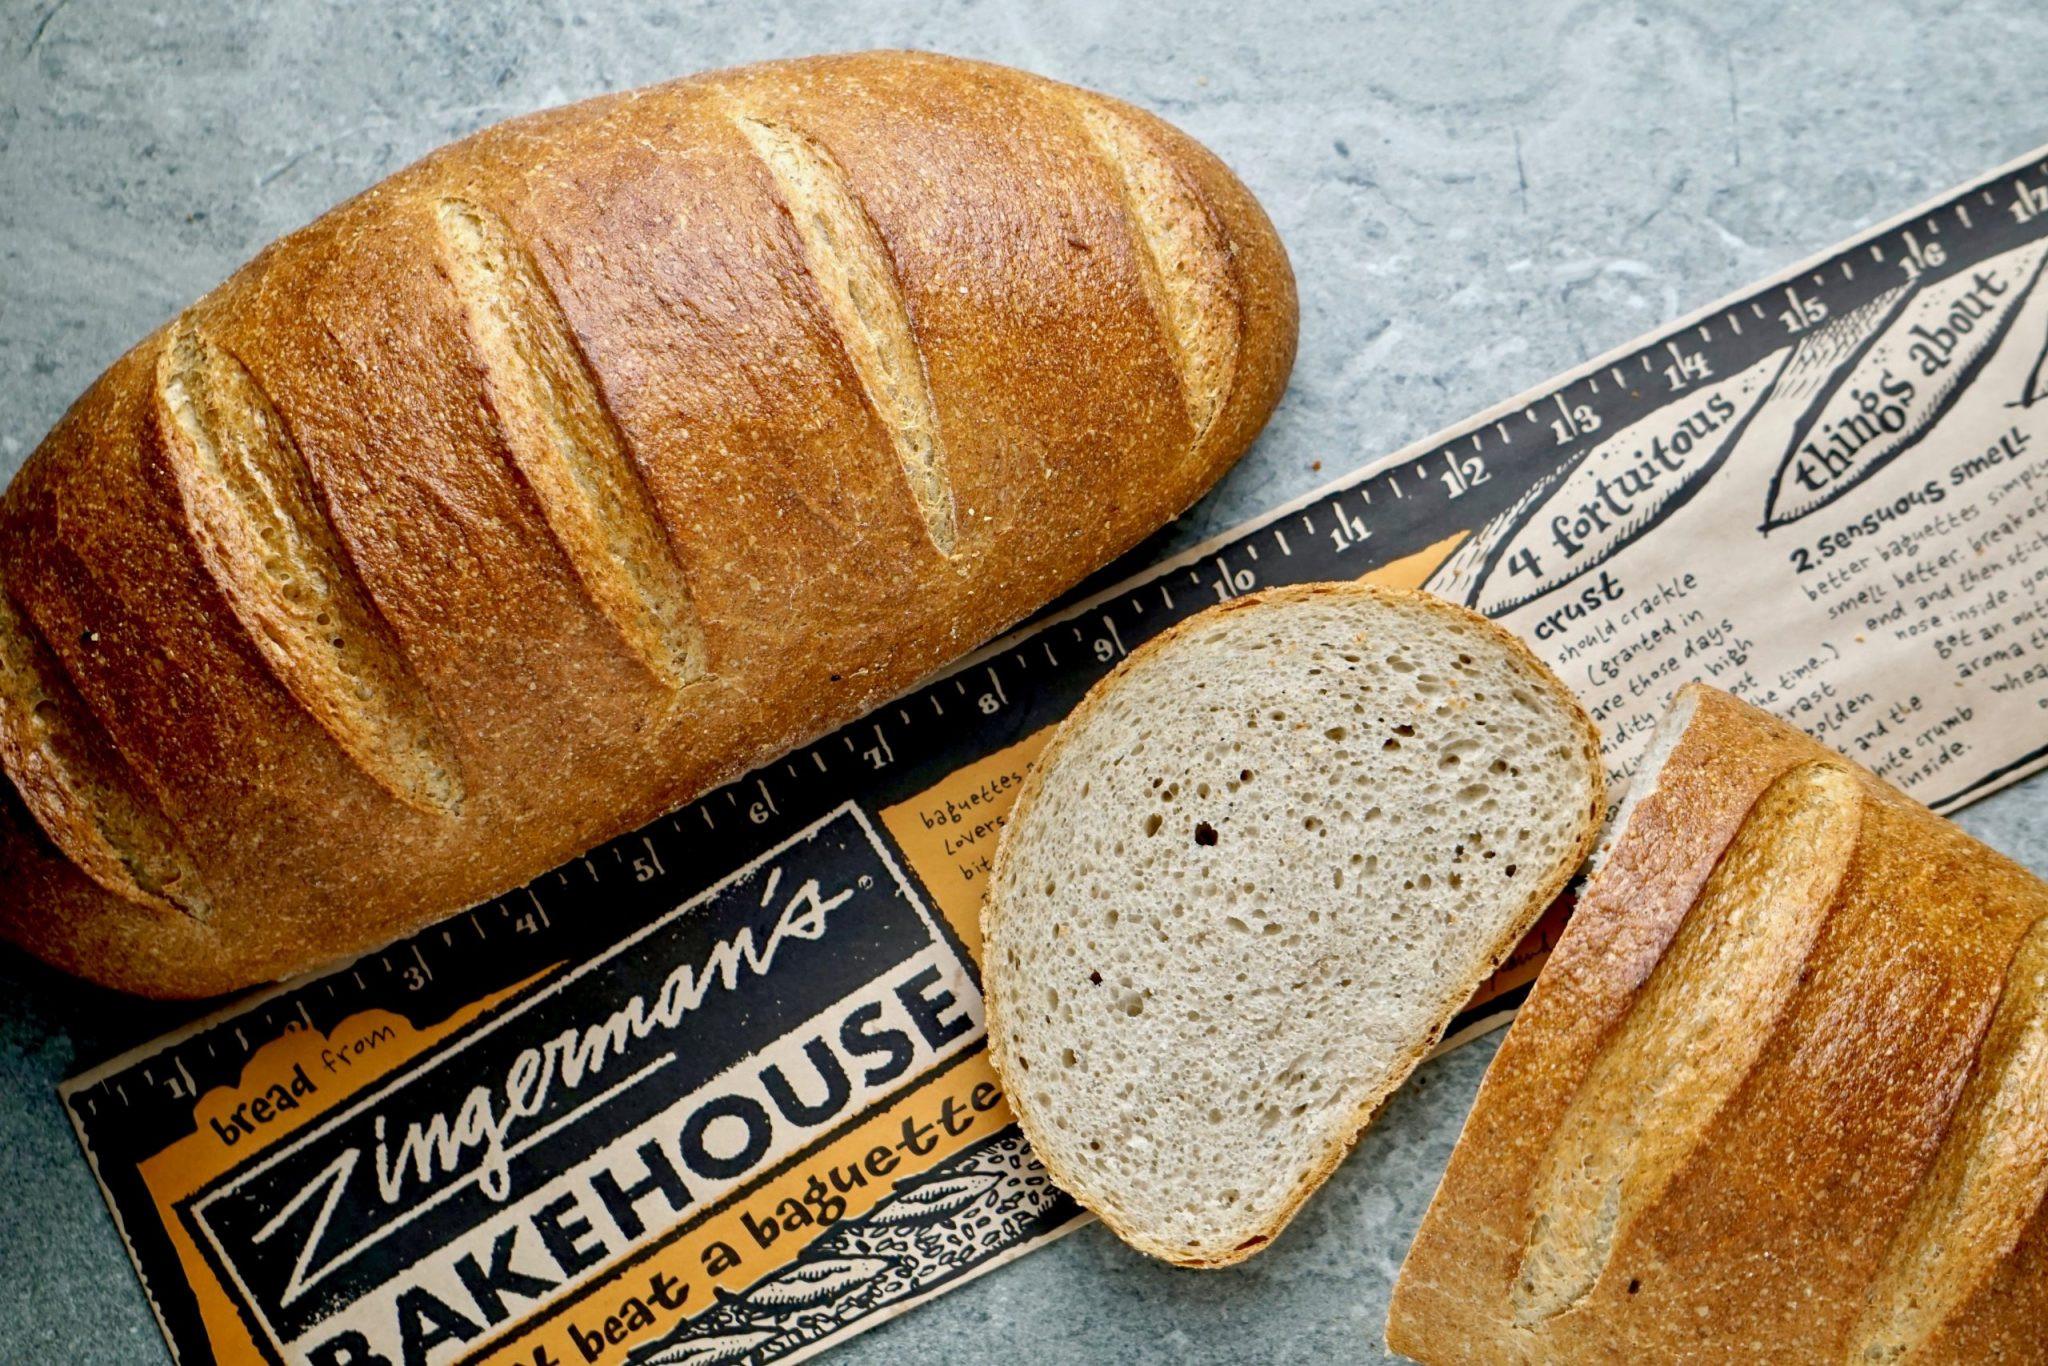 Jewish Rye Bread, Sliced